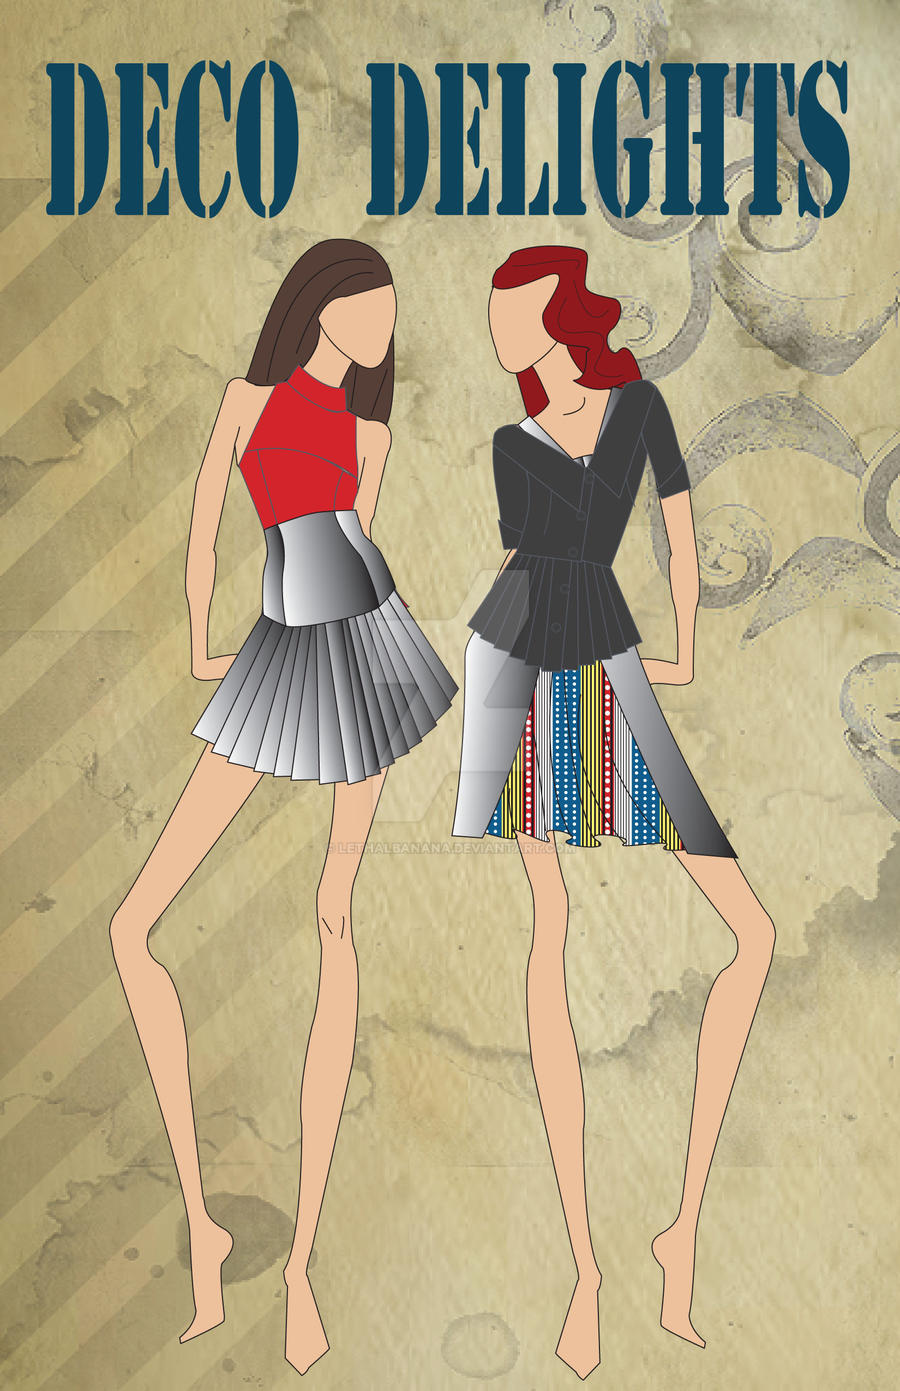 Art deco fashion illustration by lethalbanana on deviantart for Art deco illustration